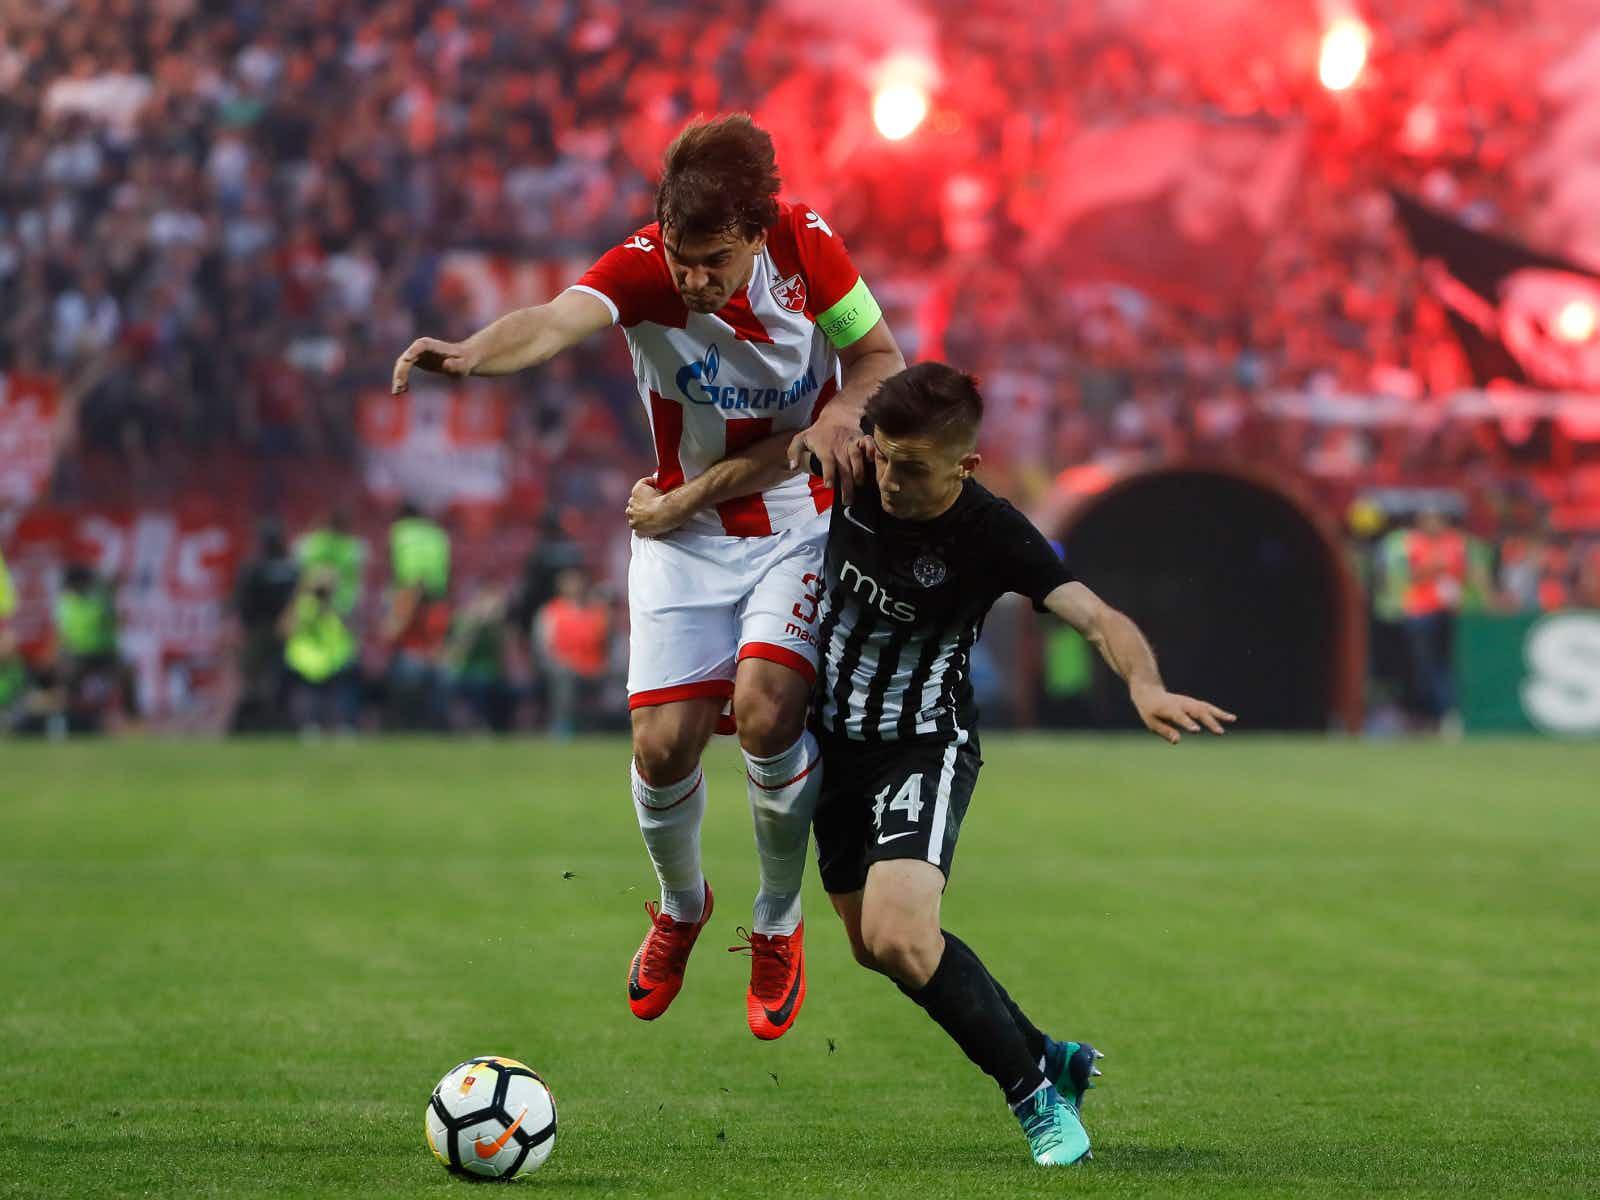 Red Star and Partizan players battle in a Serbian Super League match at Marakana stadium © Srdjan Stevanovic / Getty Images